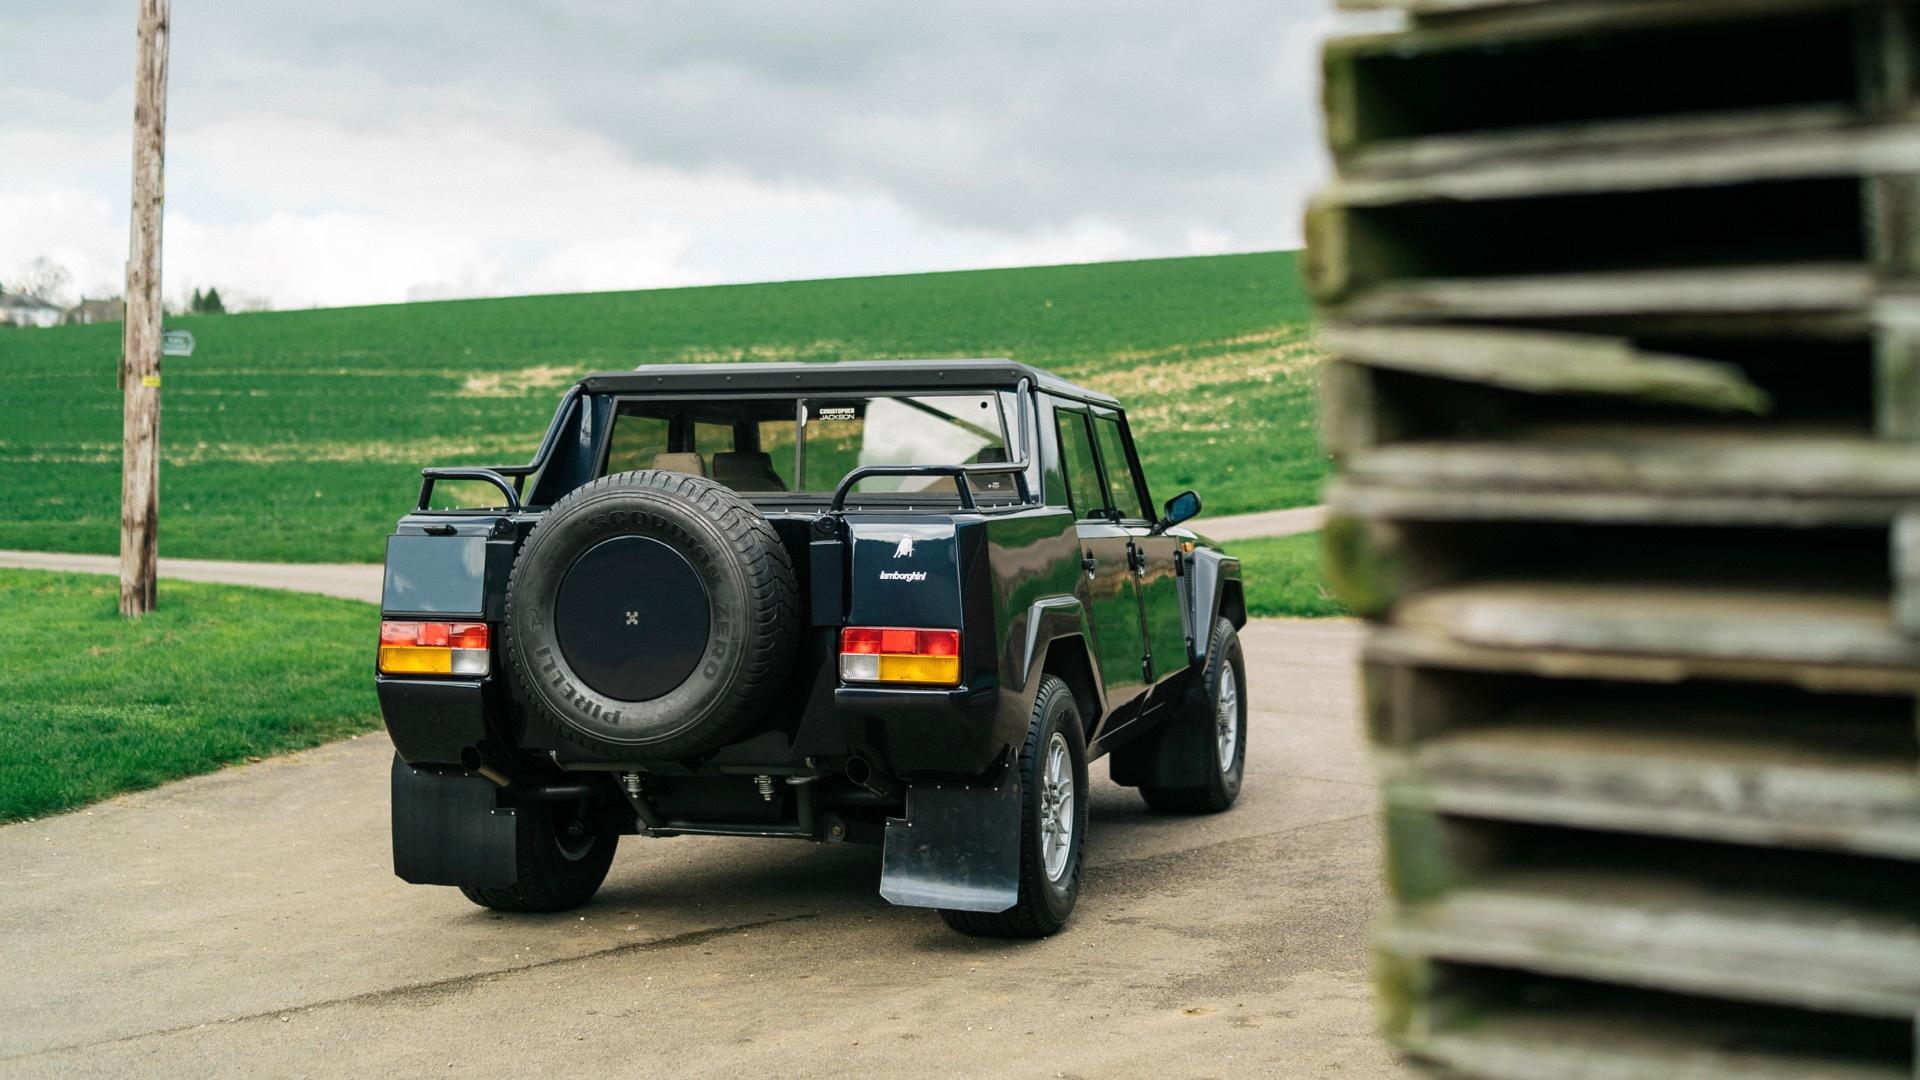 1987 Lamborghini LM002 restored by Bell Sport & Classic